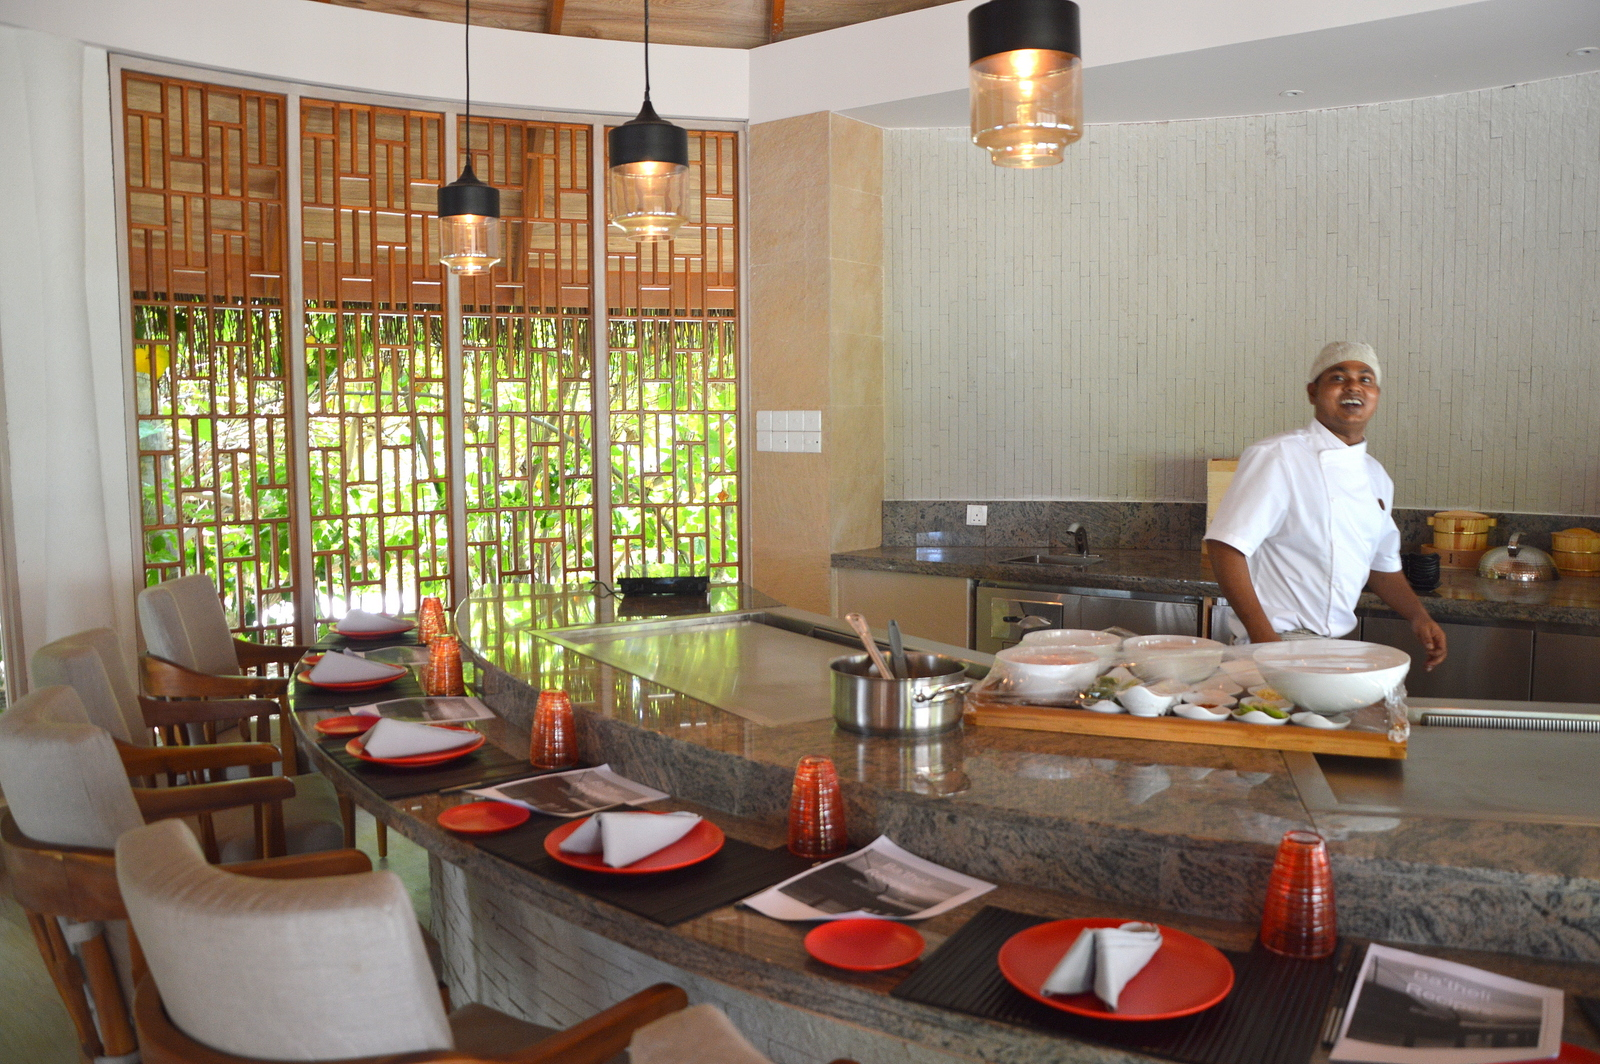 Malediven    die neue Trauminsel Milaidhoo im Baa Atoll strand sonne reisebericht malediven honeymoon 2  TUI Berlin Reisebüro Malediven Milaidhoo Island Chefs Table